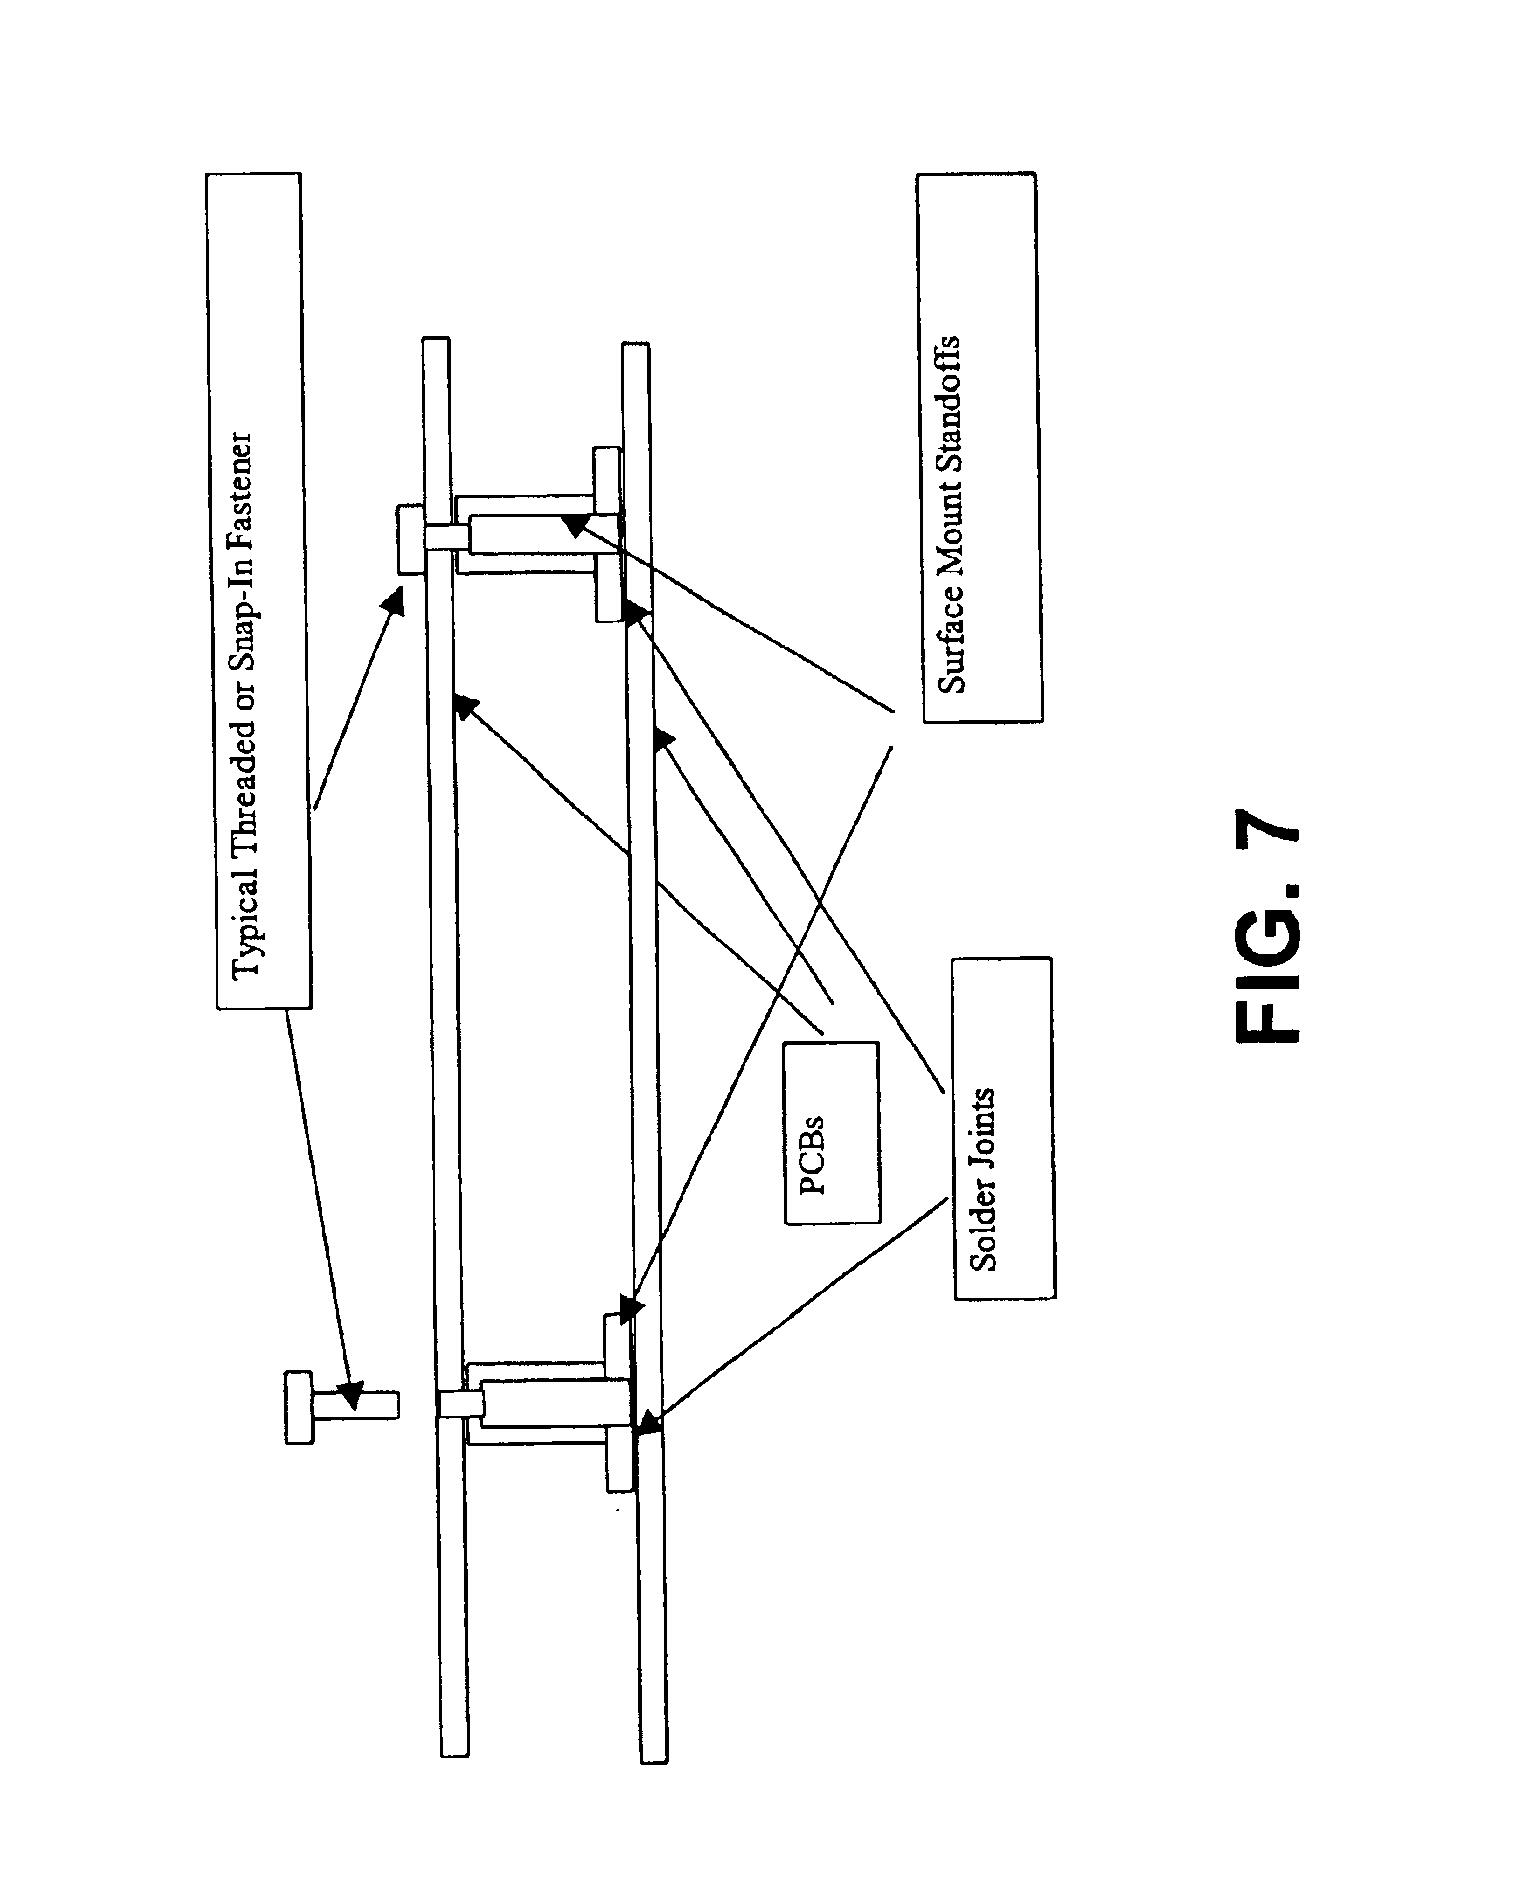 patent us6923691 - circuit board standoff